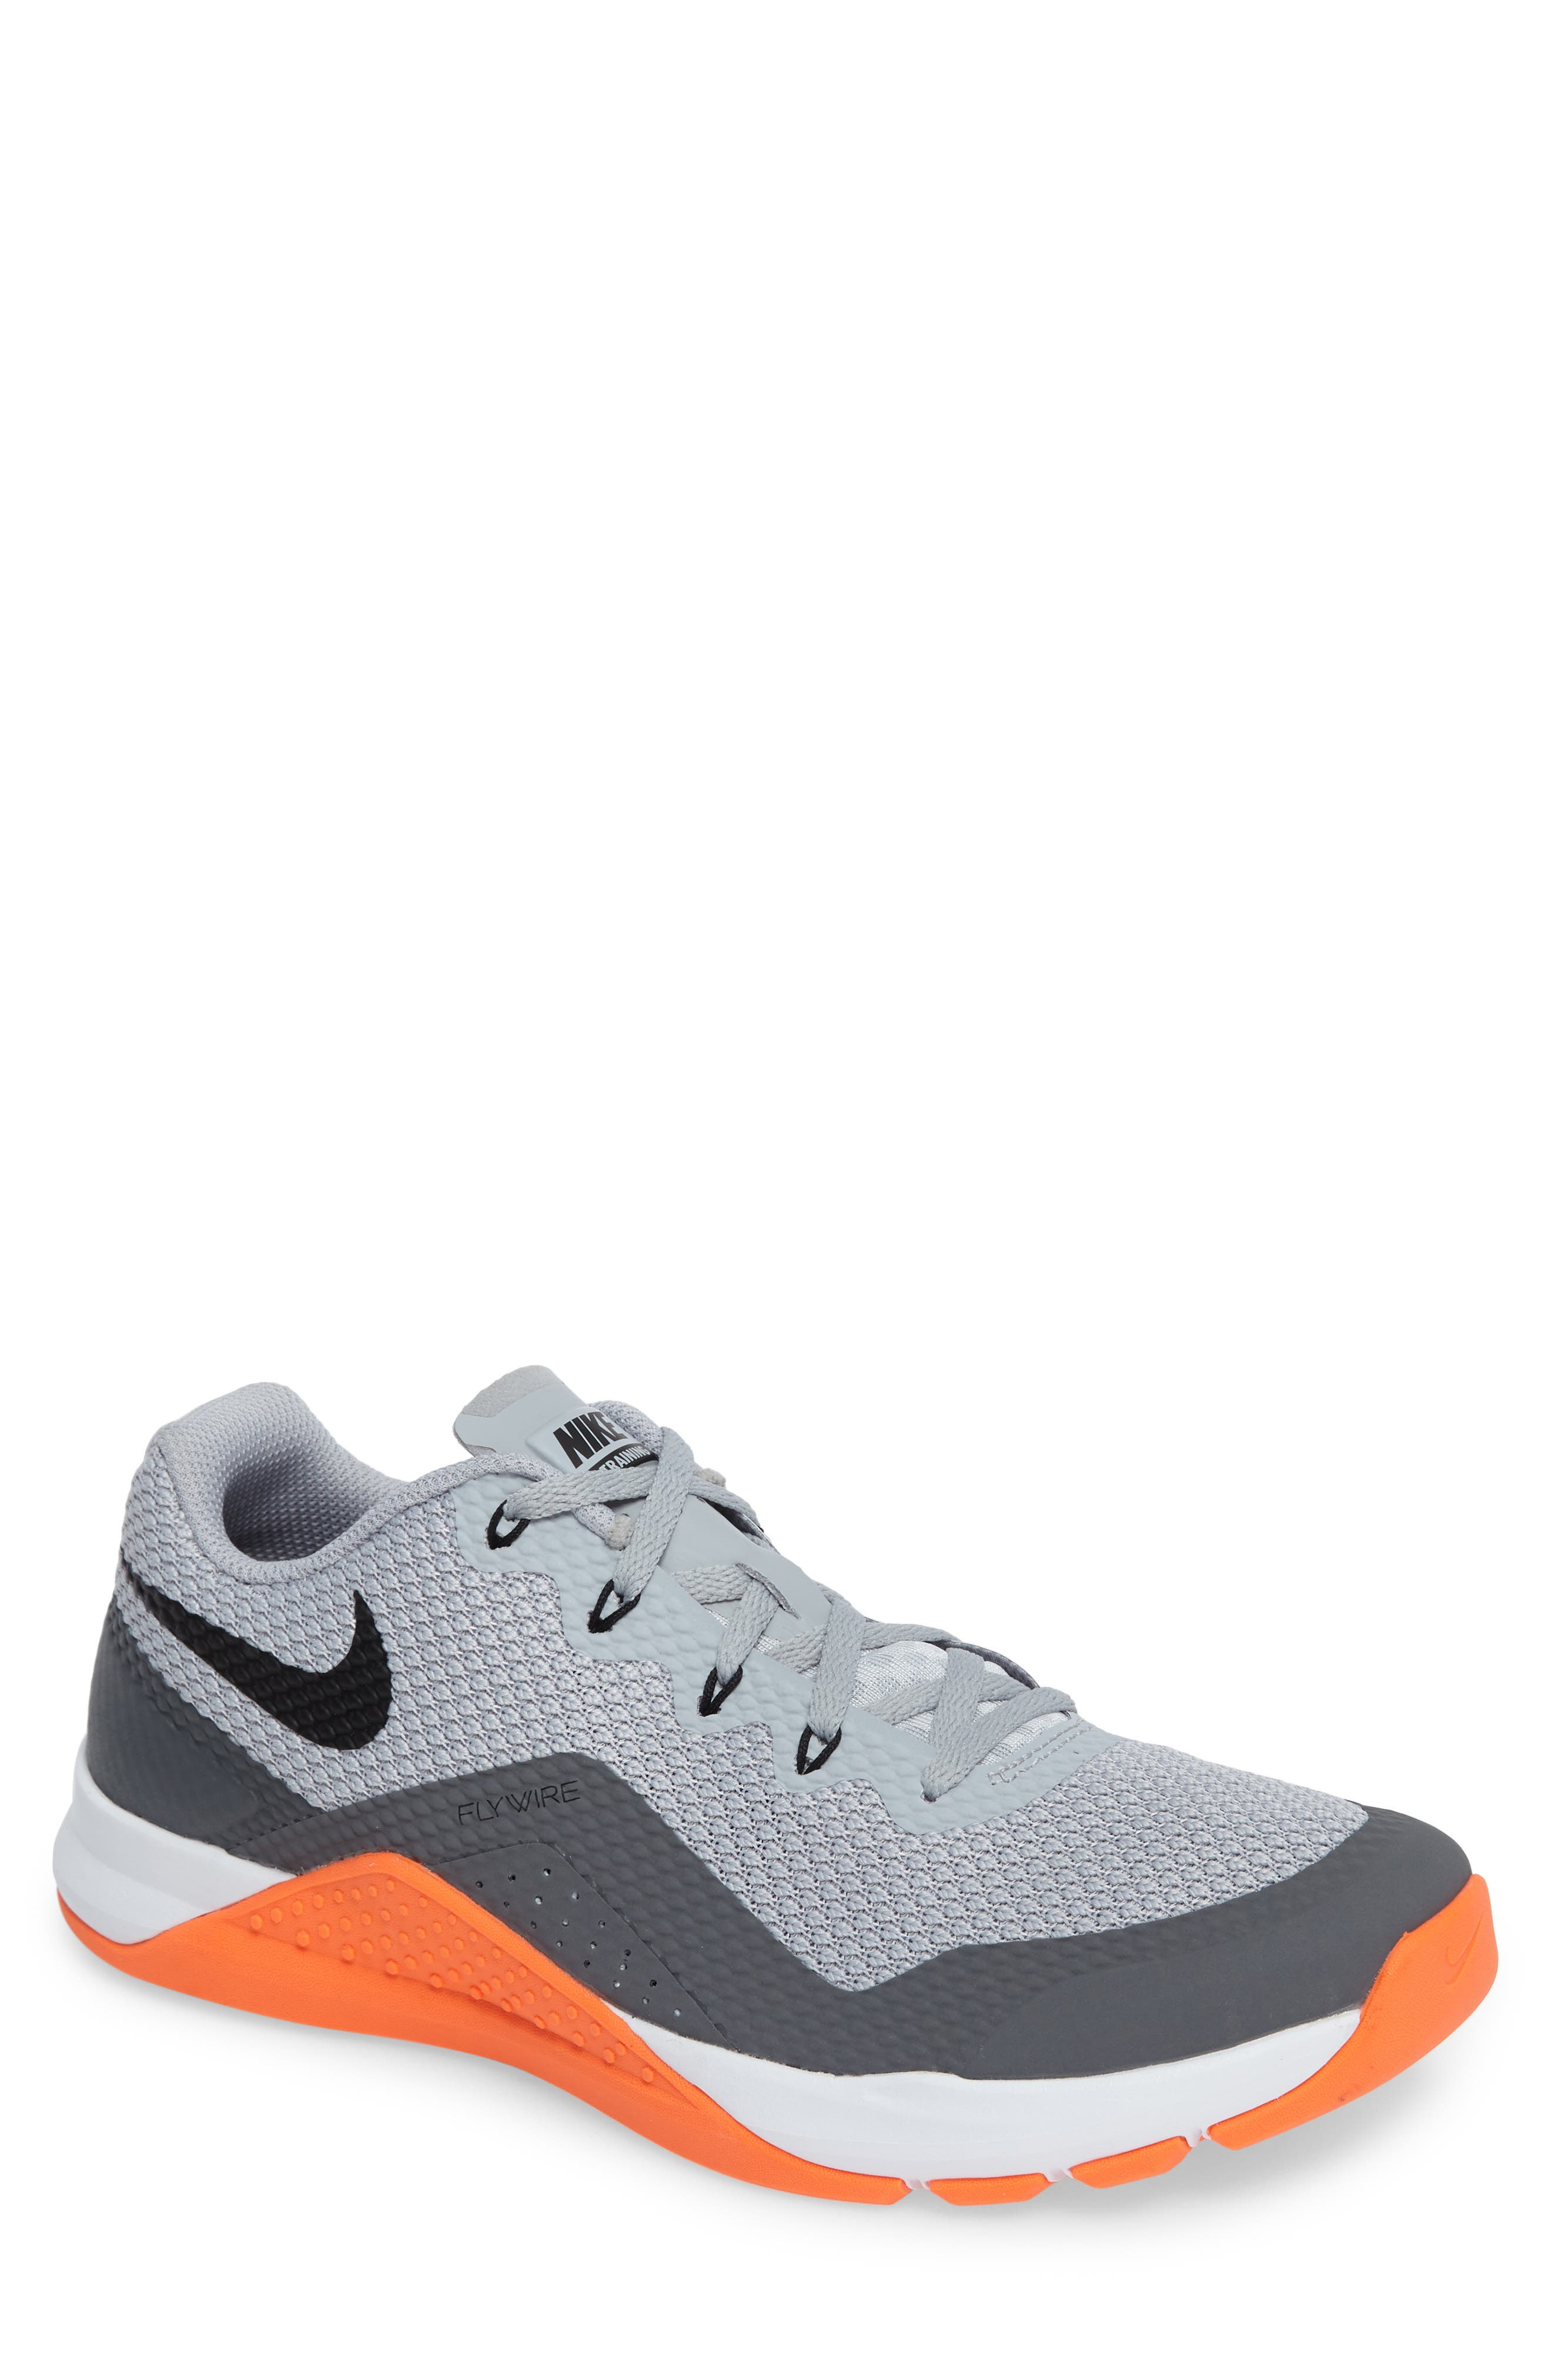 Metcon Repper DSX Training Shoe, Main, color, 026